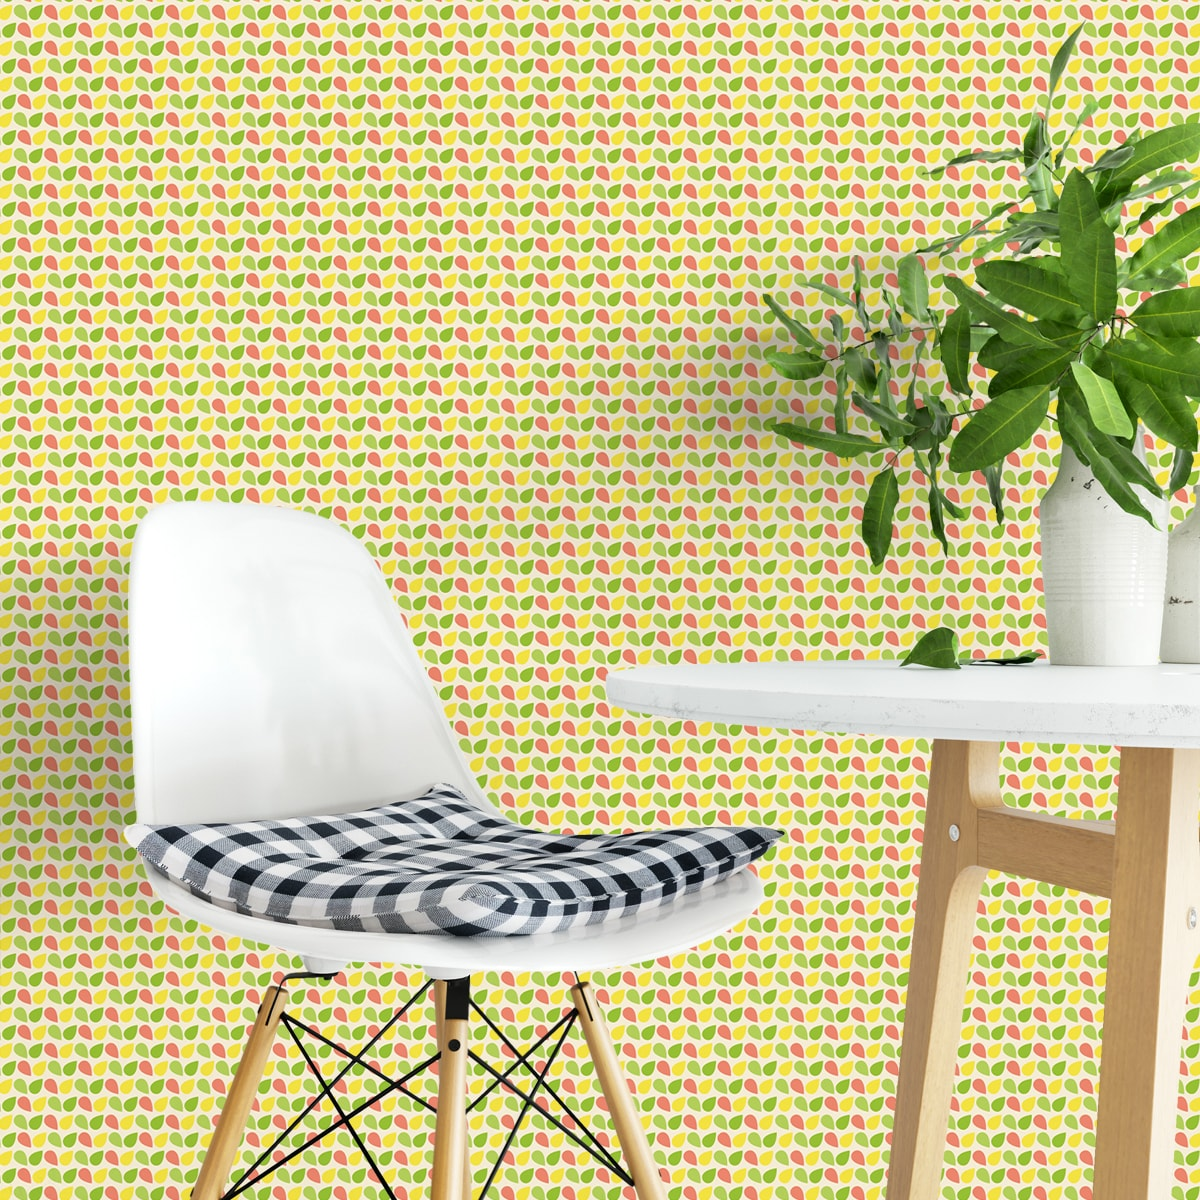 "Wandtapete gelb: Fröhliche kleingemusterte Tropfen Tapete ""Funny Drops"" in grün angepasst an Farrow and Ball Wandfarben- Vliestapete Grafische"